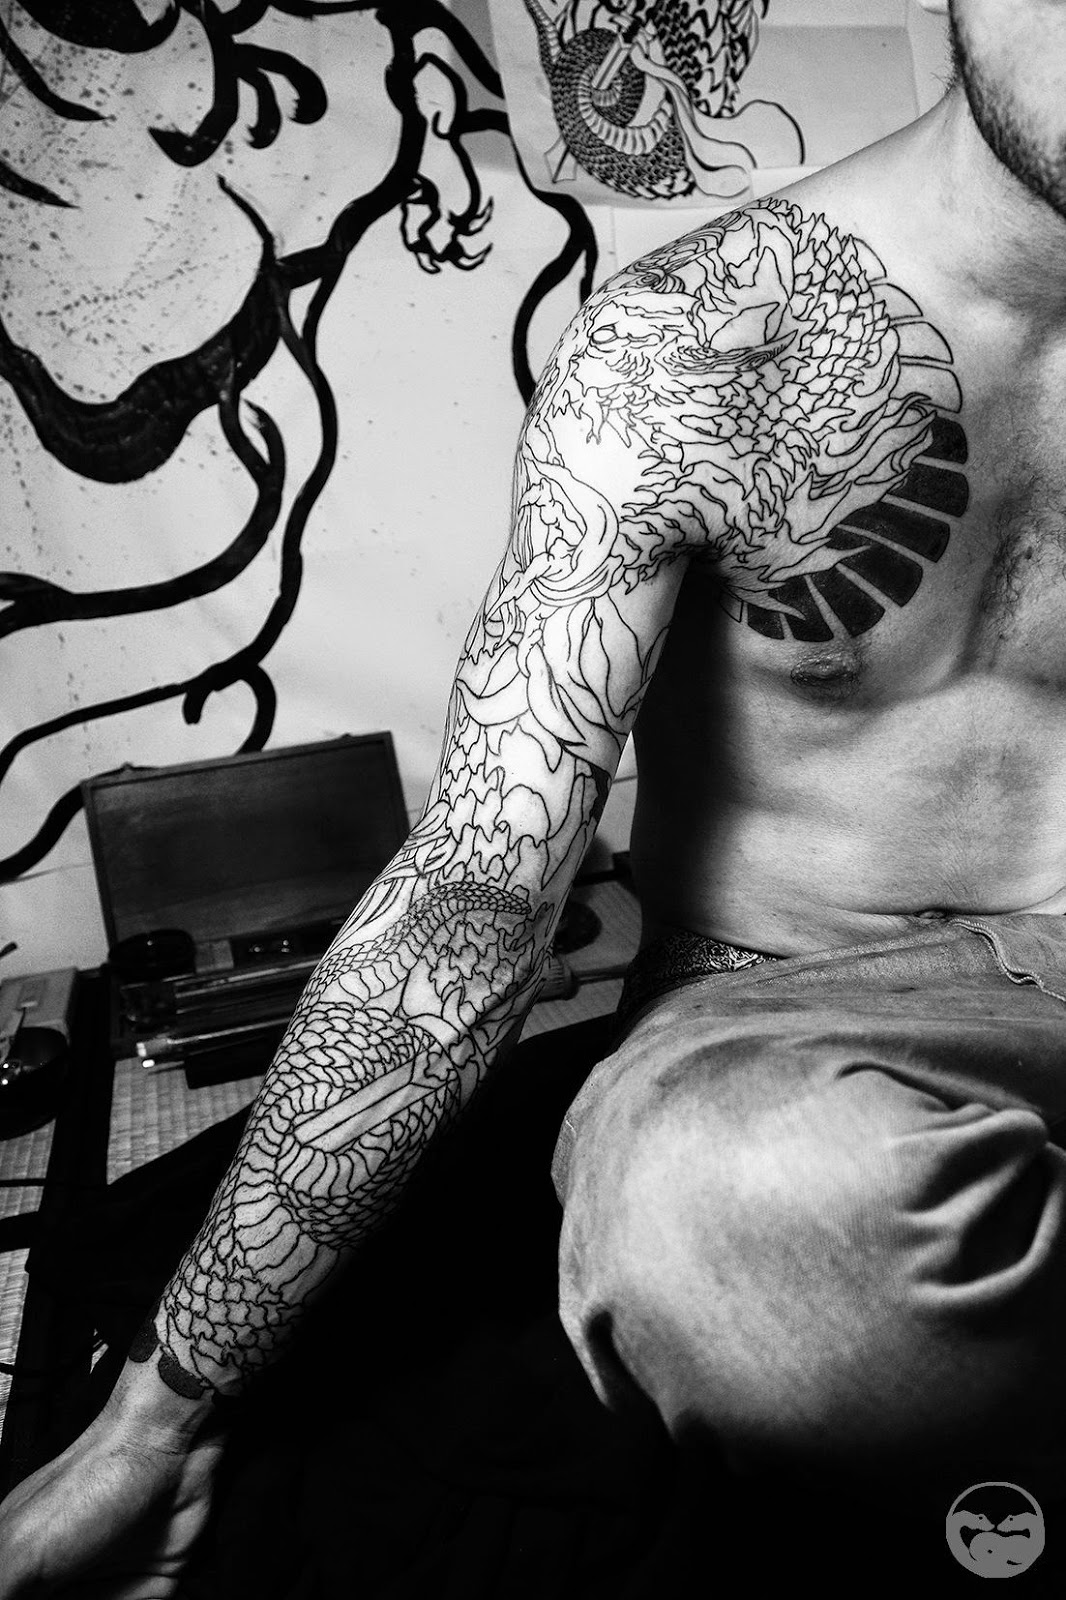 Spécialiste Tatouage Japonais - Keithtattoo tatoueur à Lyon spécialiste tatouage japonais